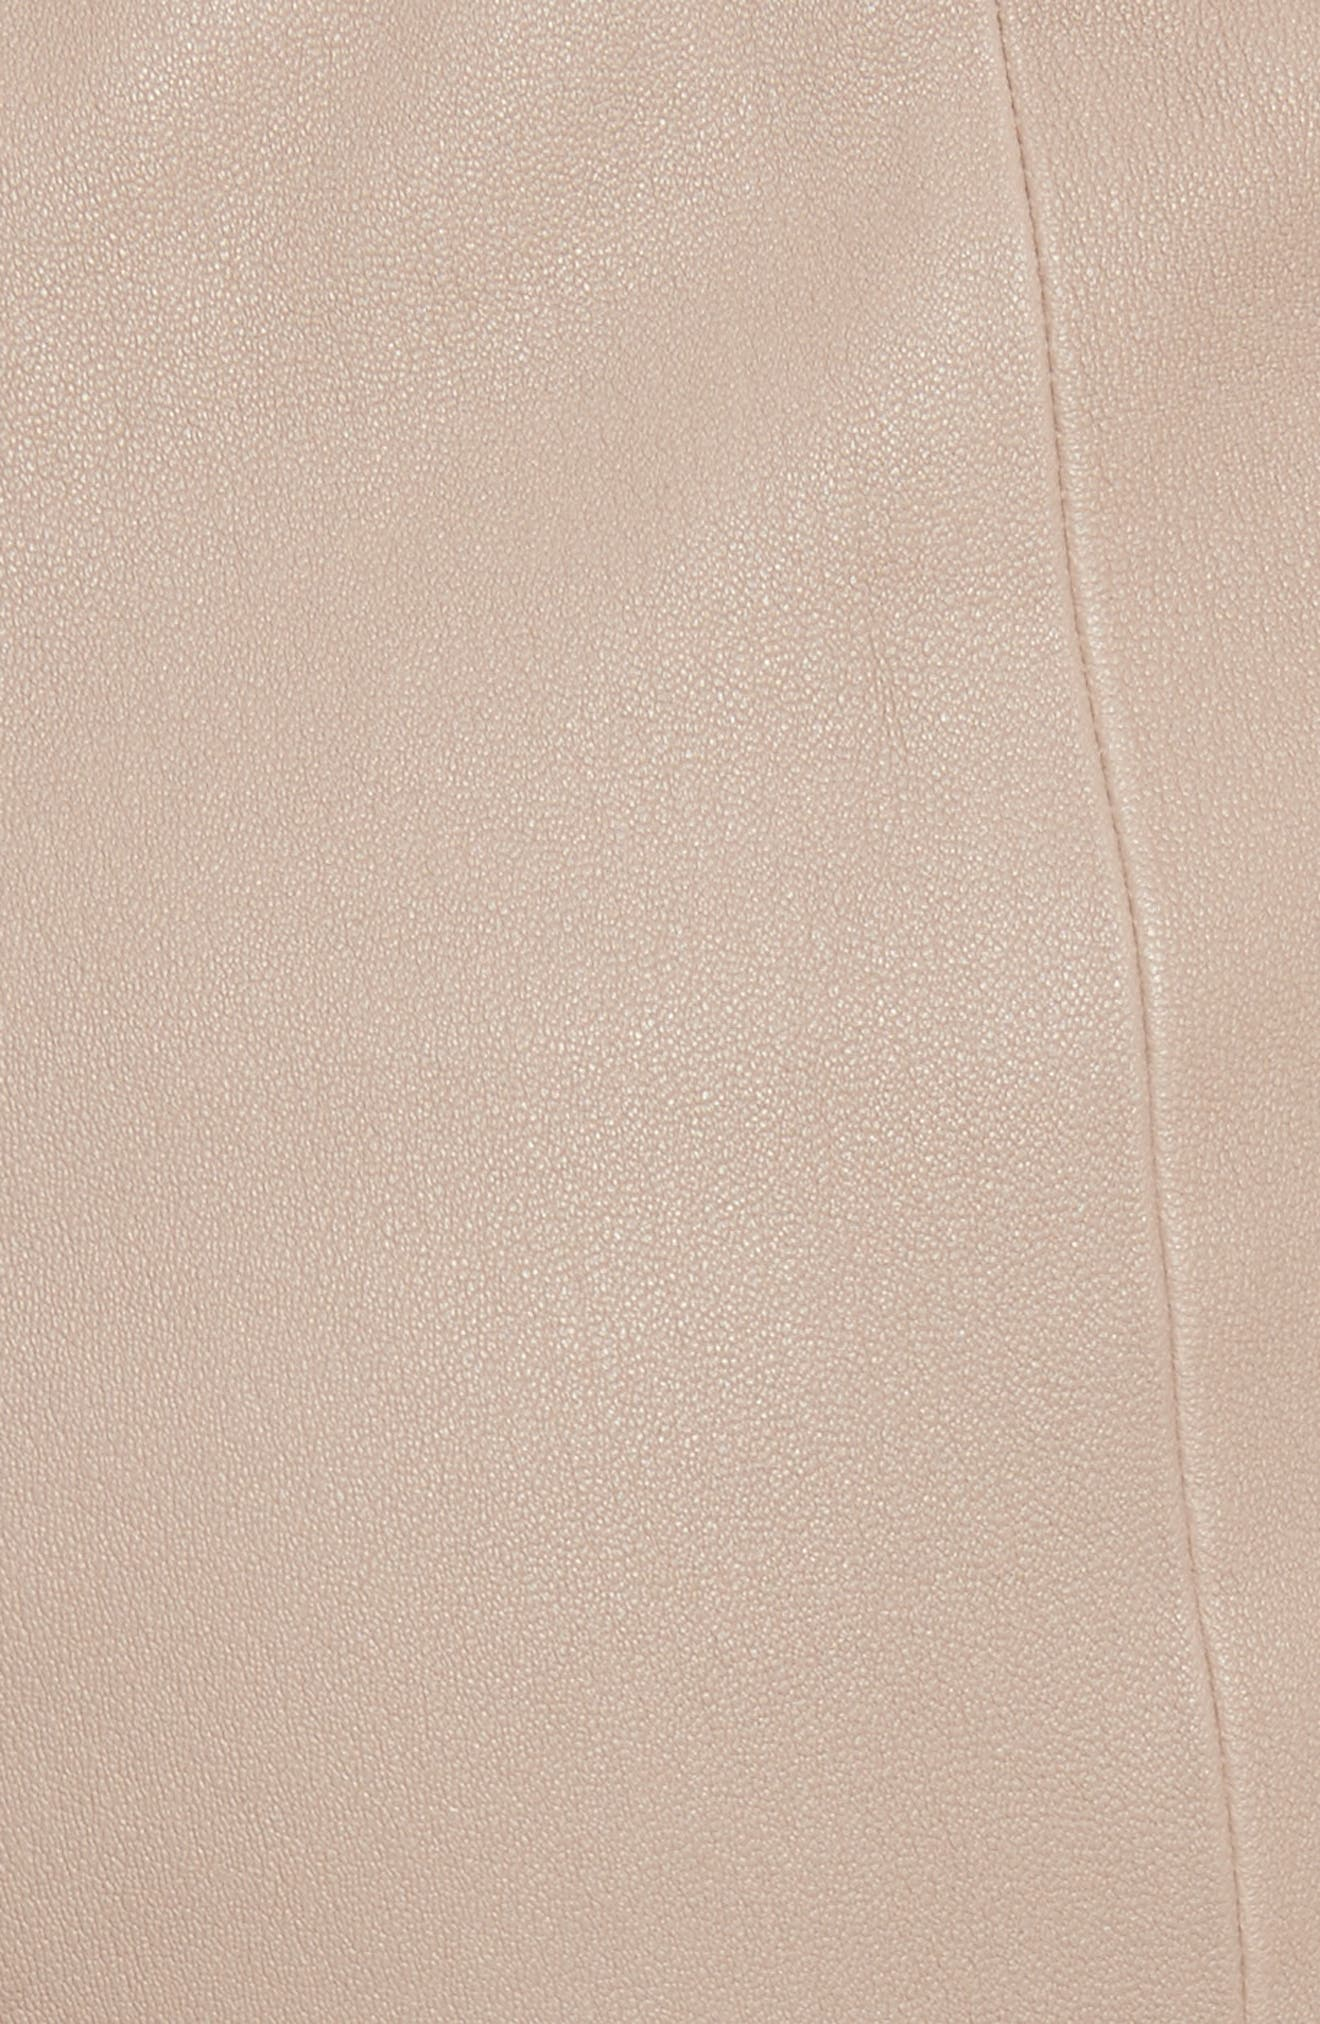 Stretch Leather Pants,                             Alternate thumbnail 5, color,                             205